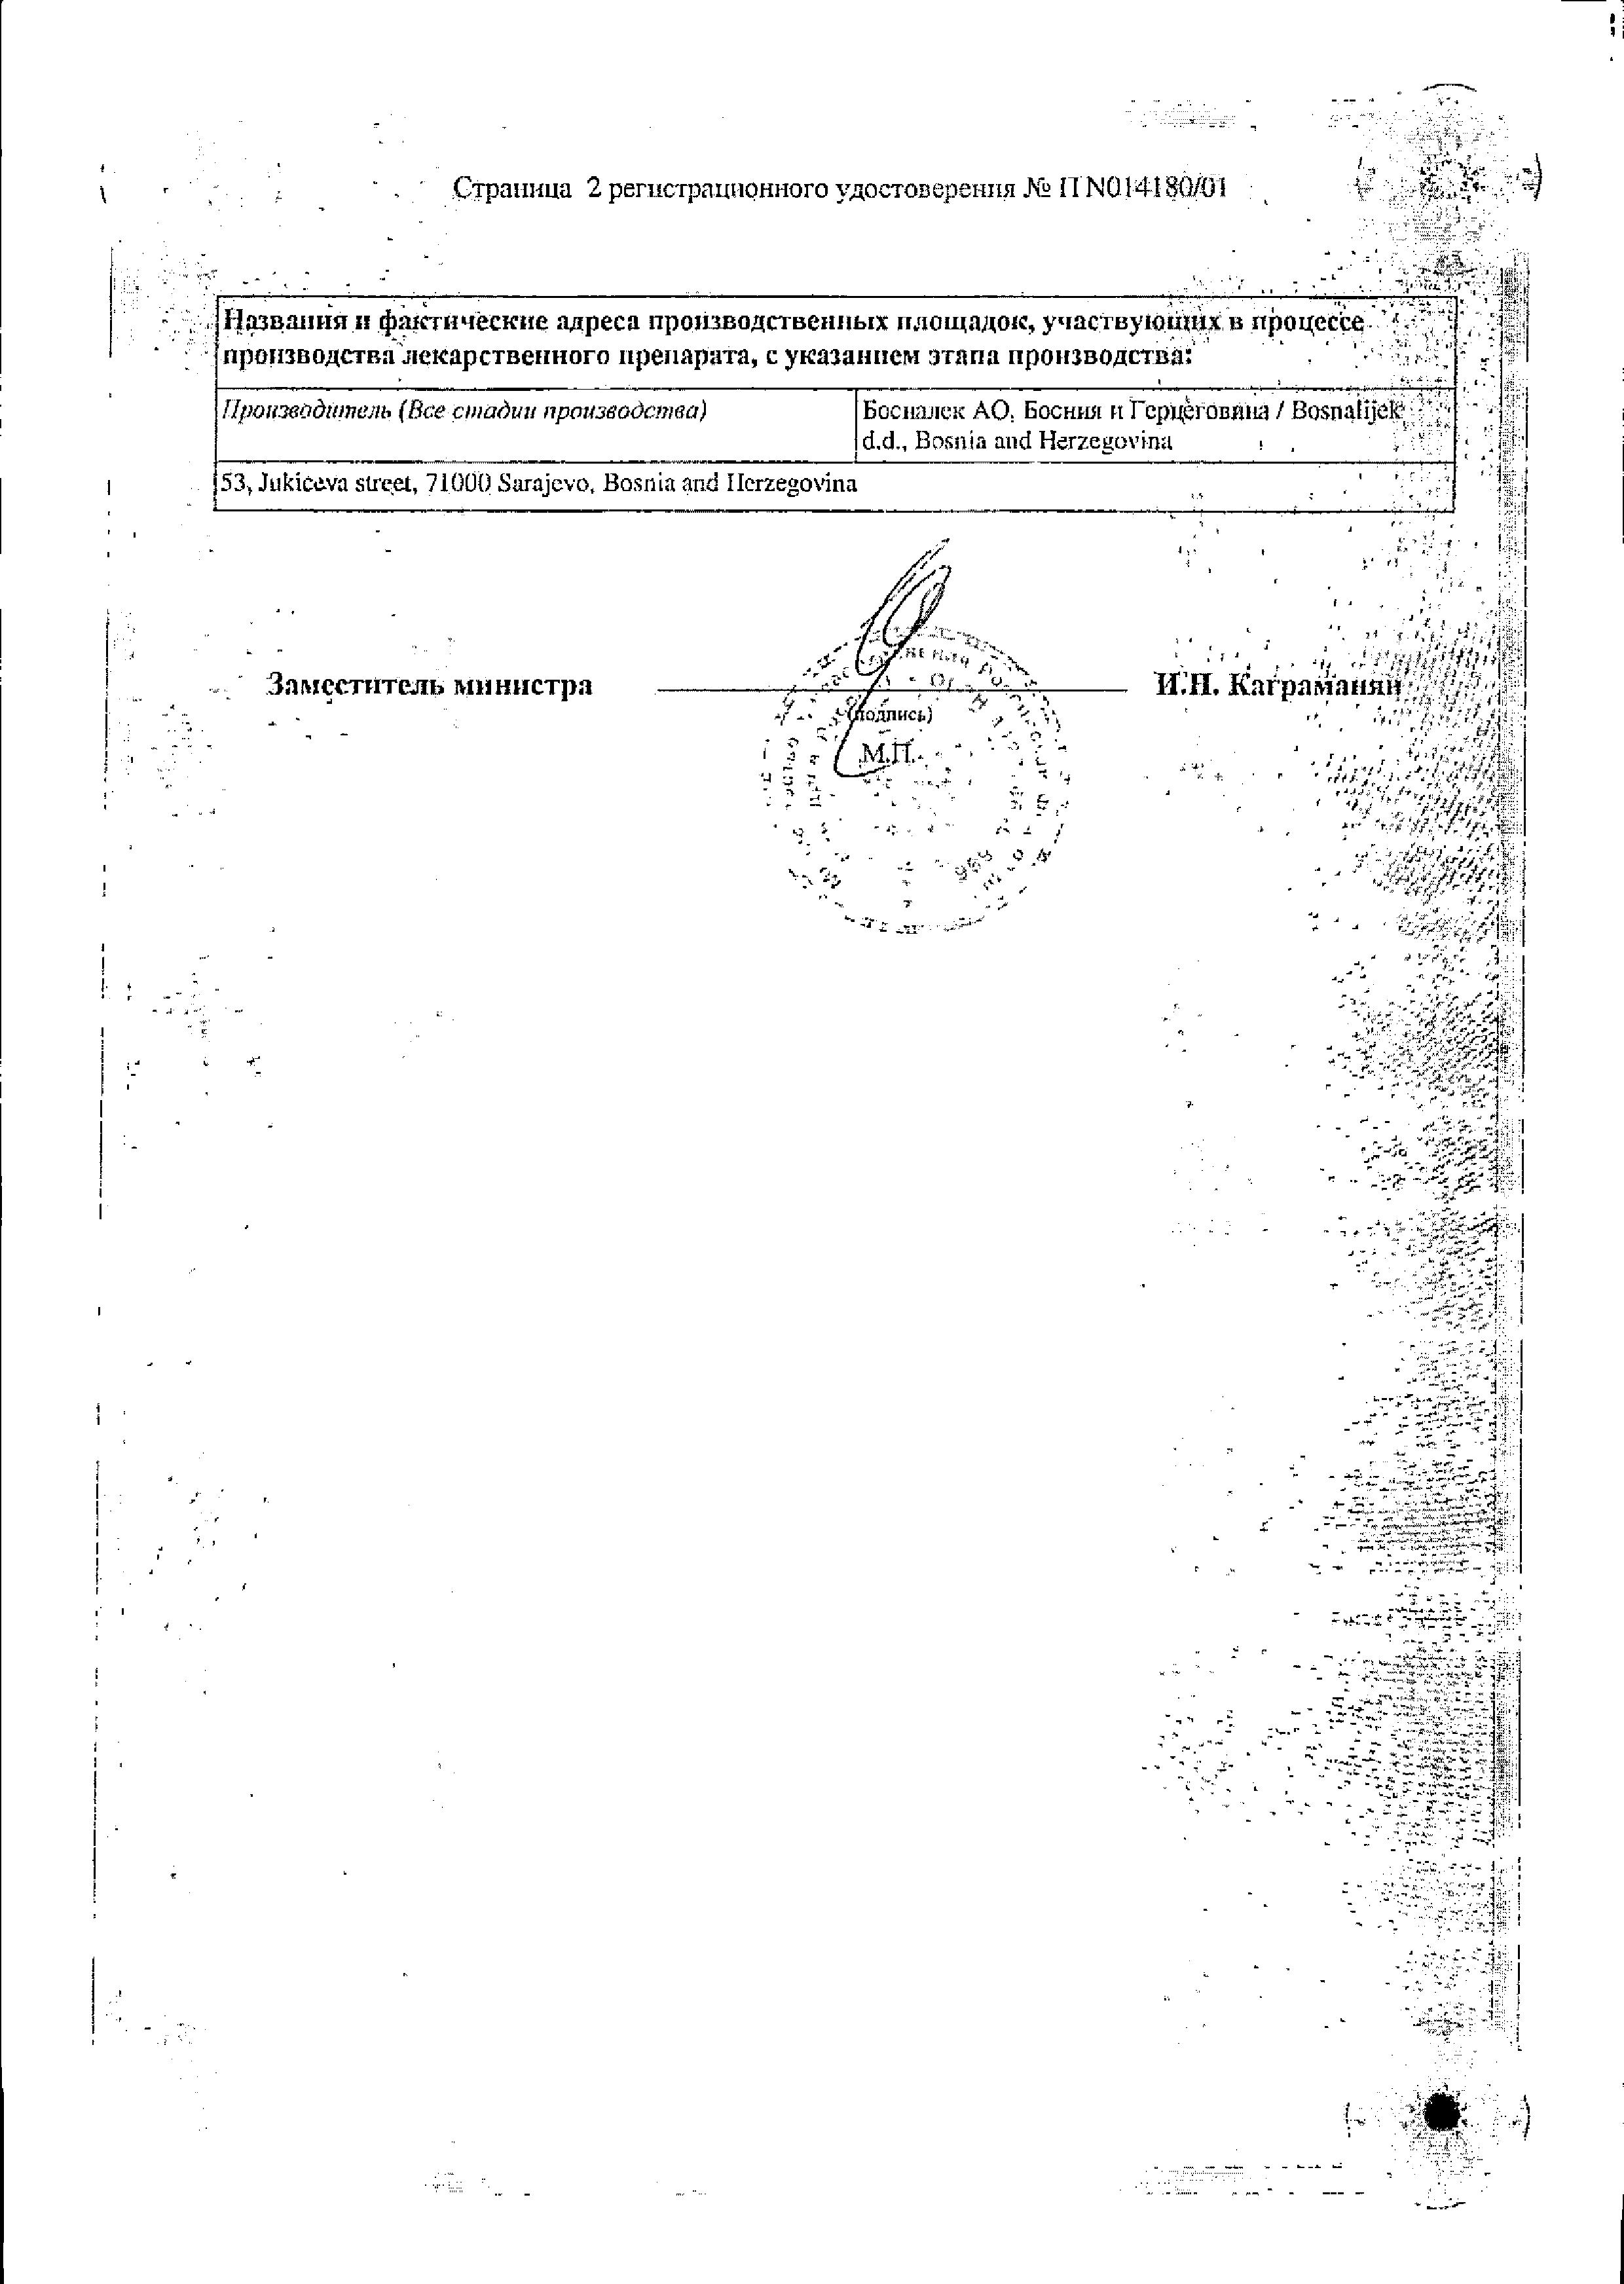 Бронхобос сертификат